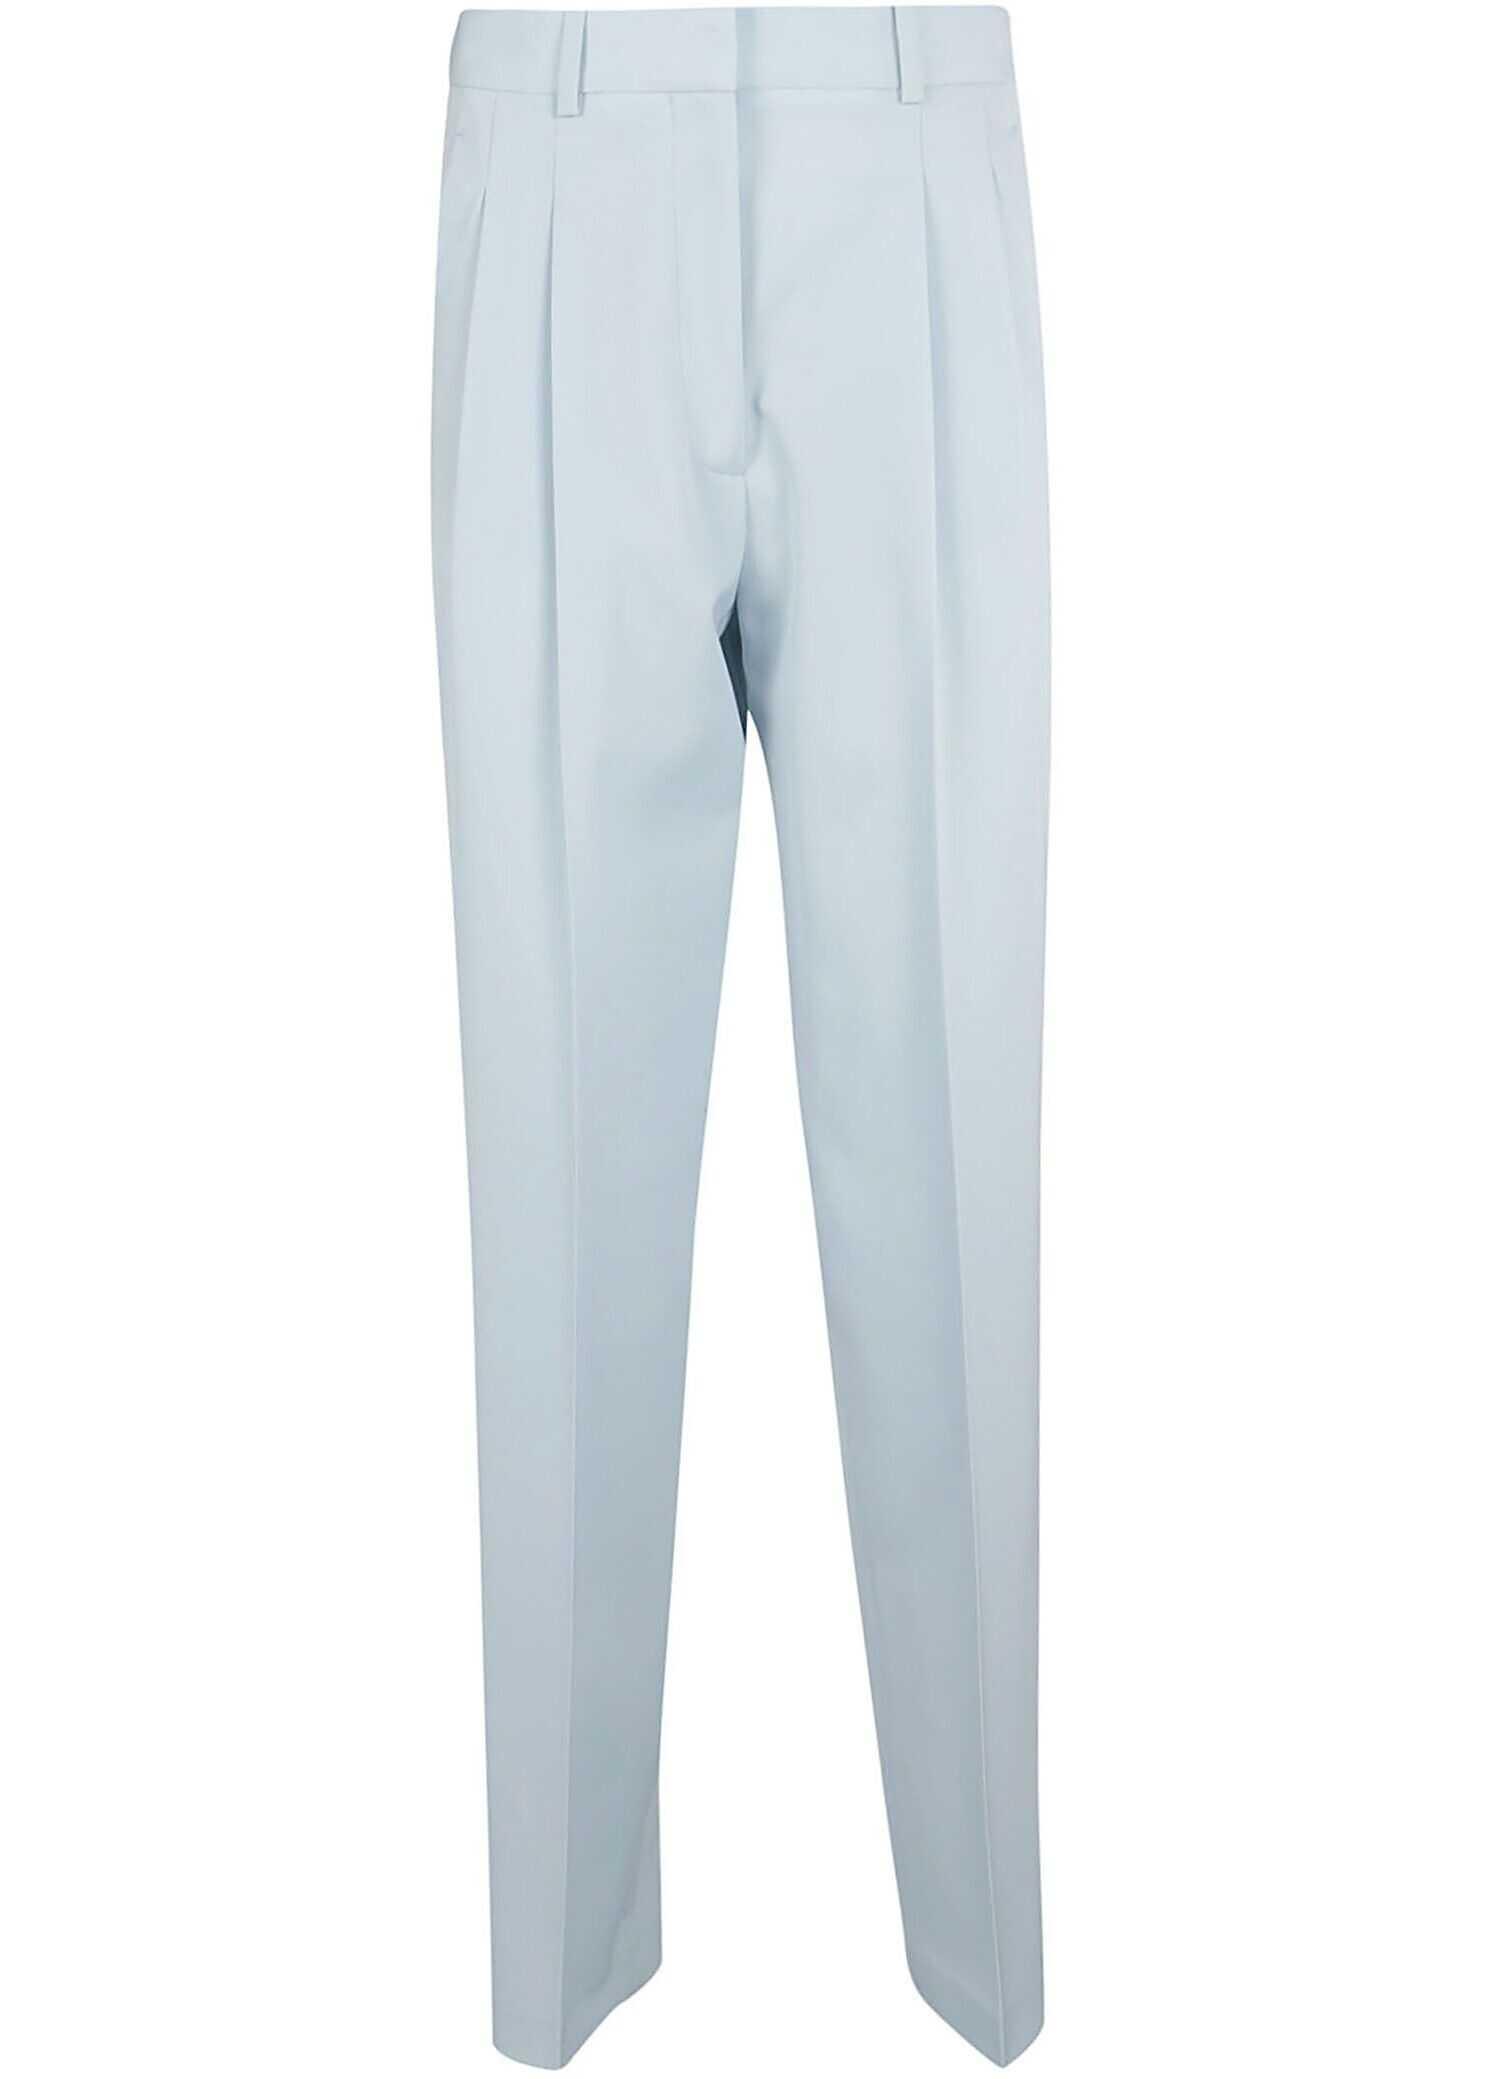 adidas by Stella McCartney Wool Pants LIGHT BLUE